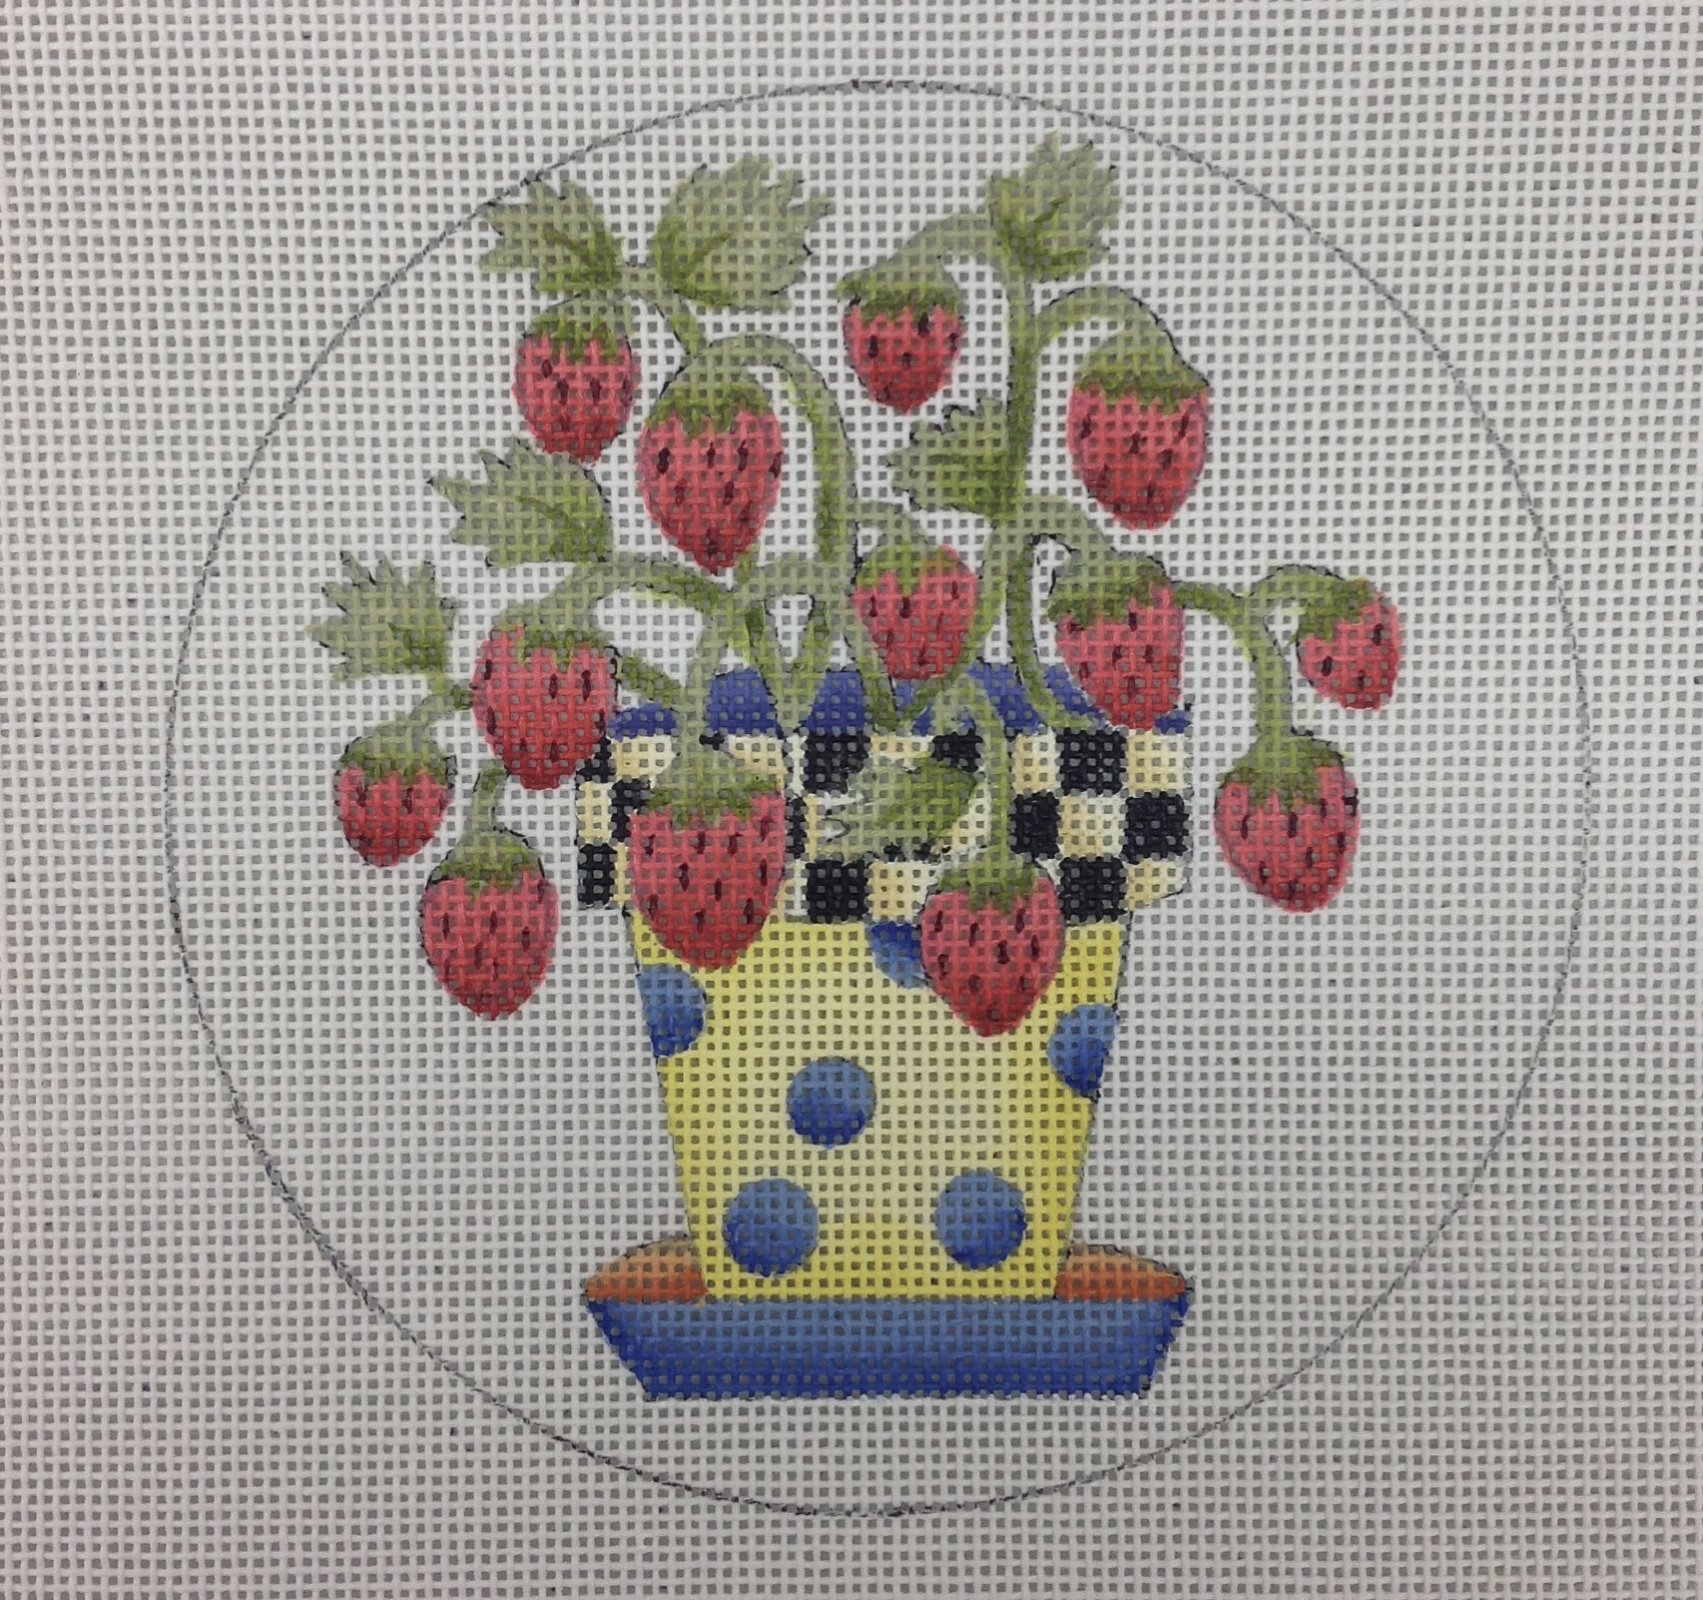 strawberry pot*